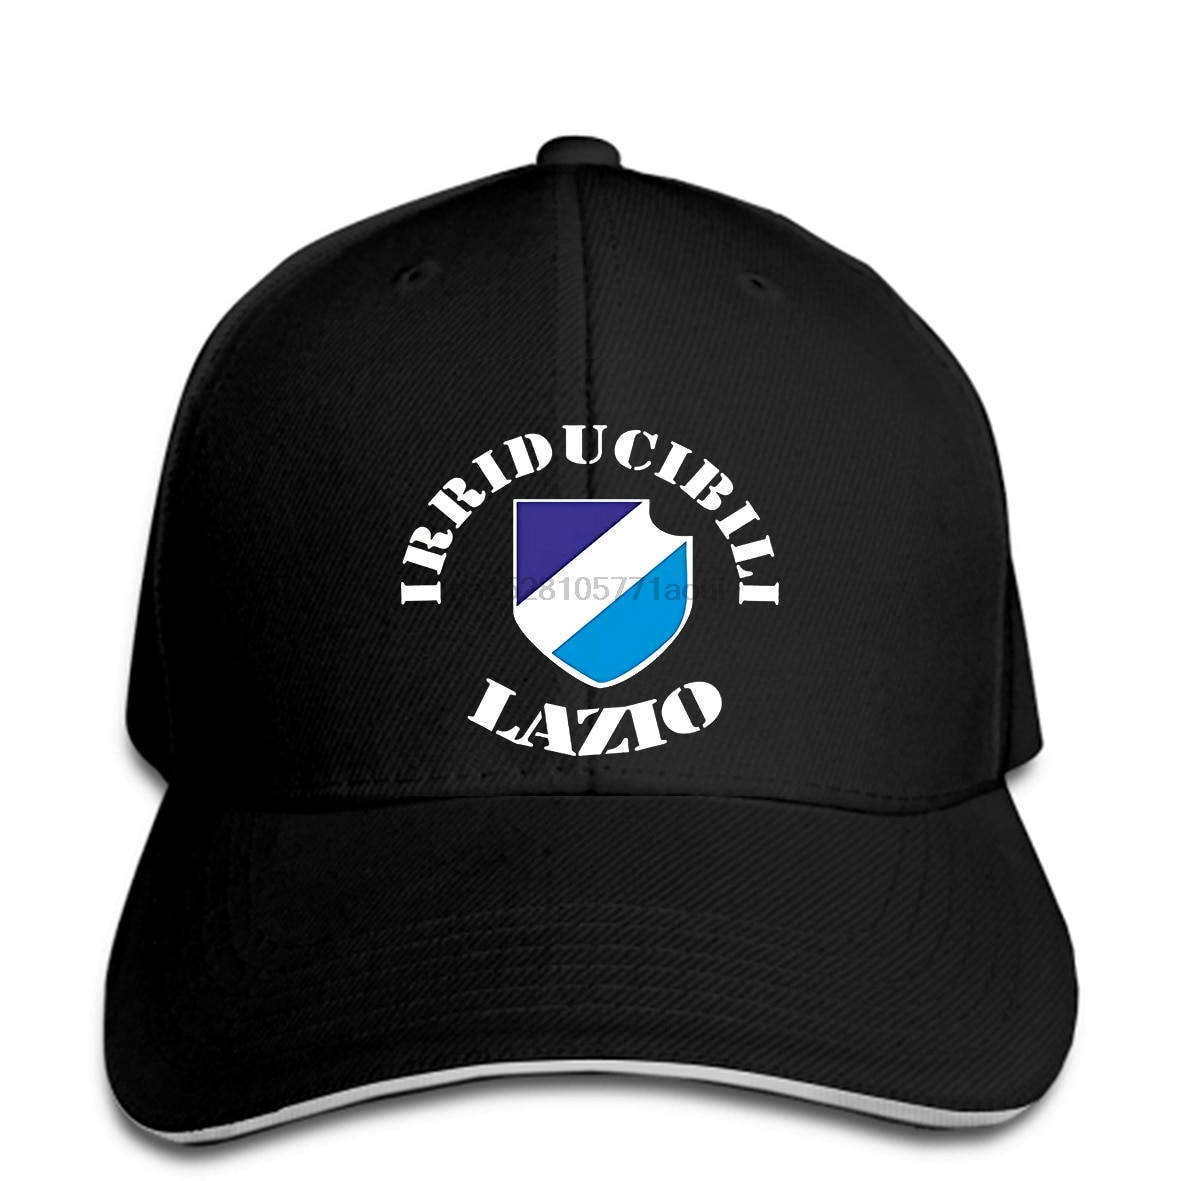 Gorra de béisbol Herren, gorras de béisbol Lazio (frontal y rcken) (Fuball Rom)